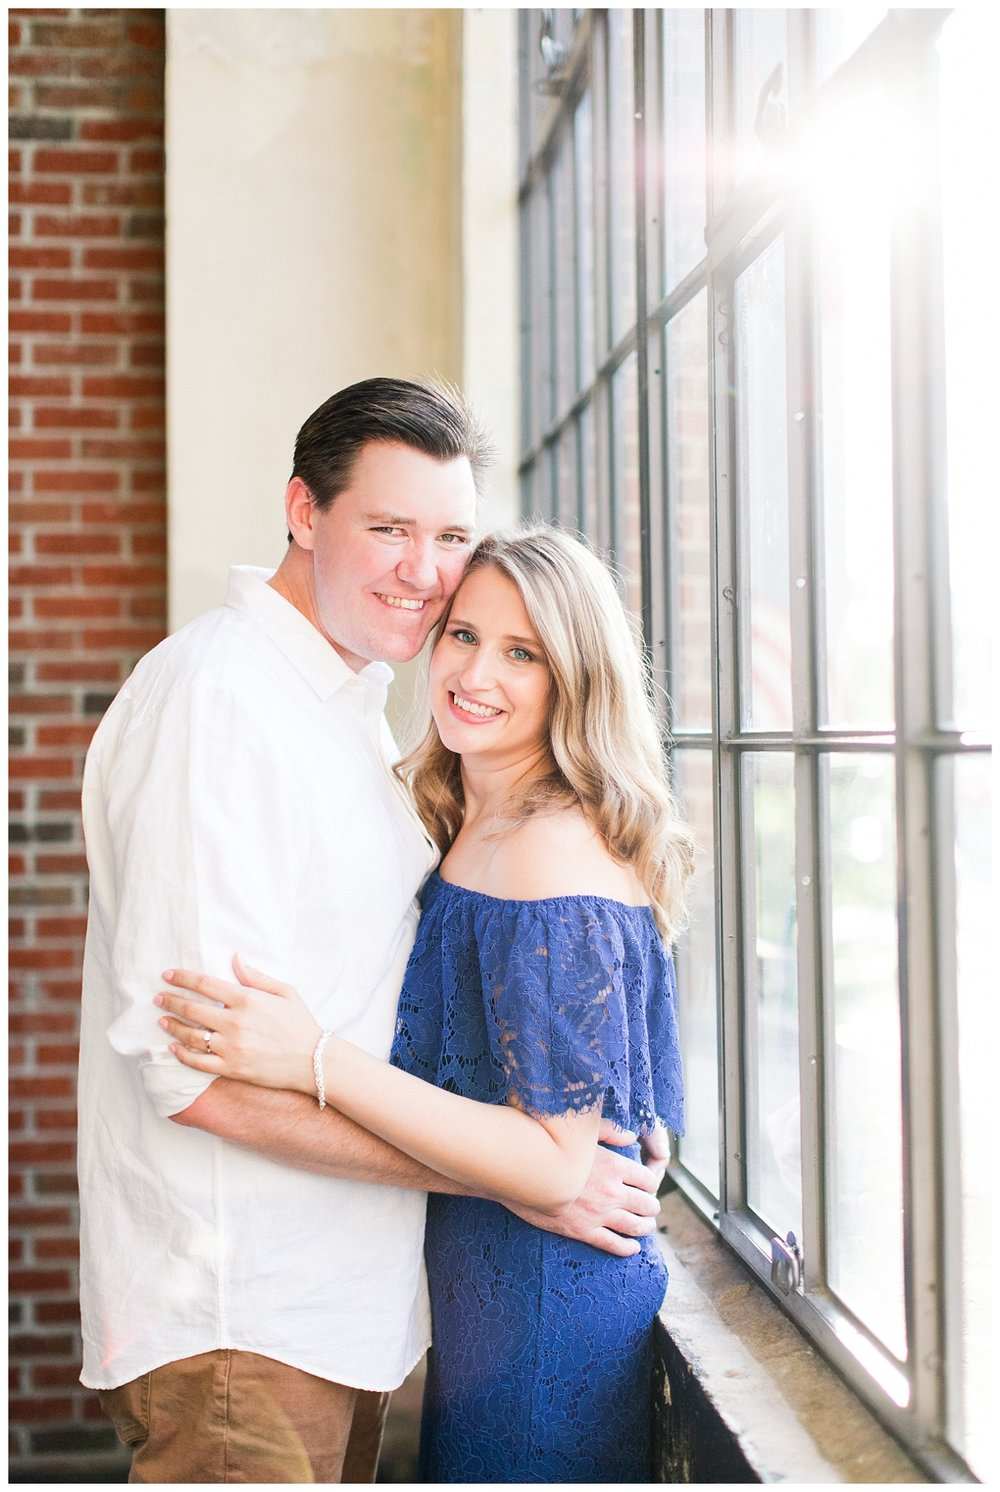 Engagement Pictures_KIm and Hamish_Abby Breaux Photography_Atlanta_Ponce City Market_Jackson Street Bridge_0019.jpg